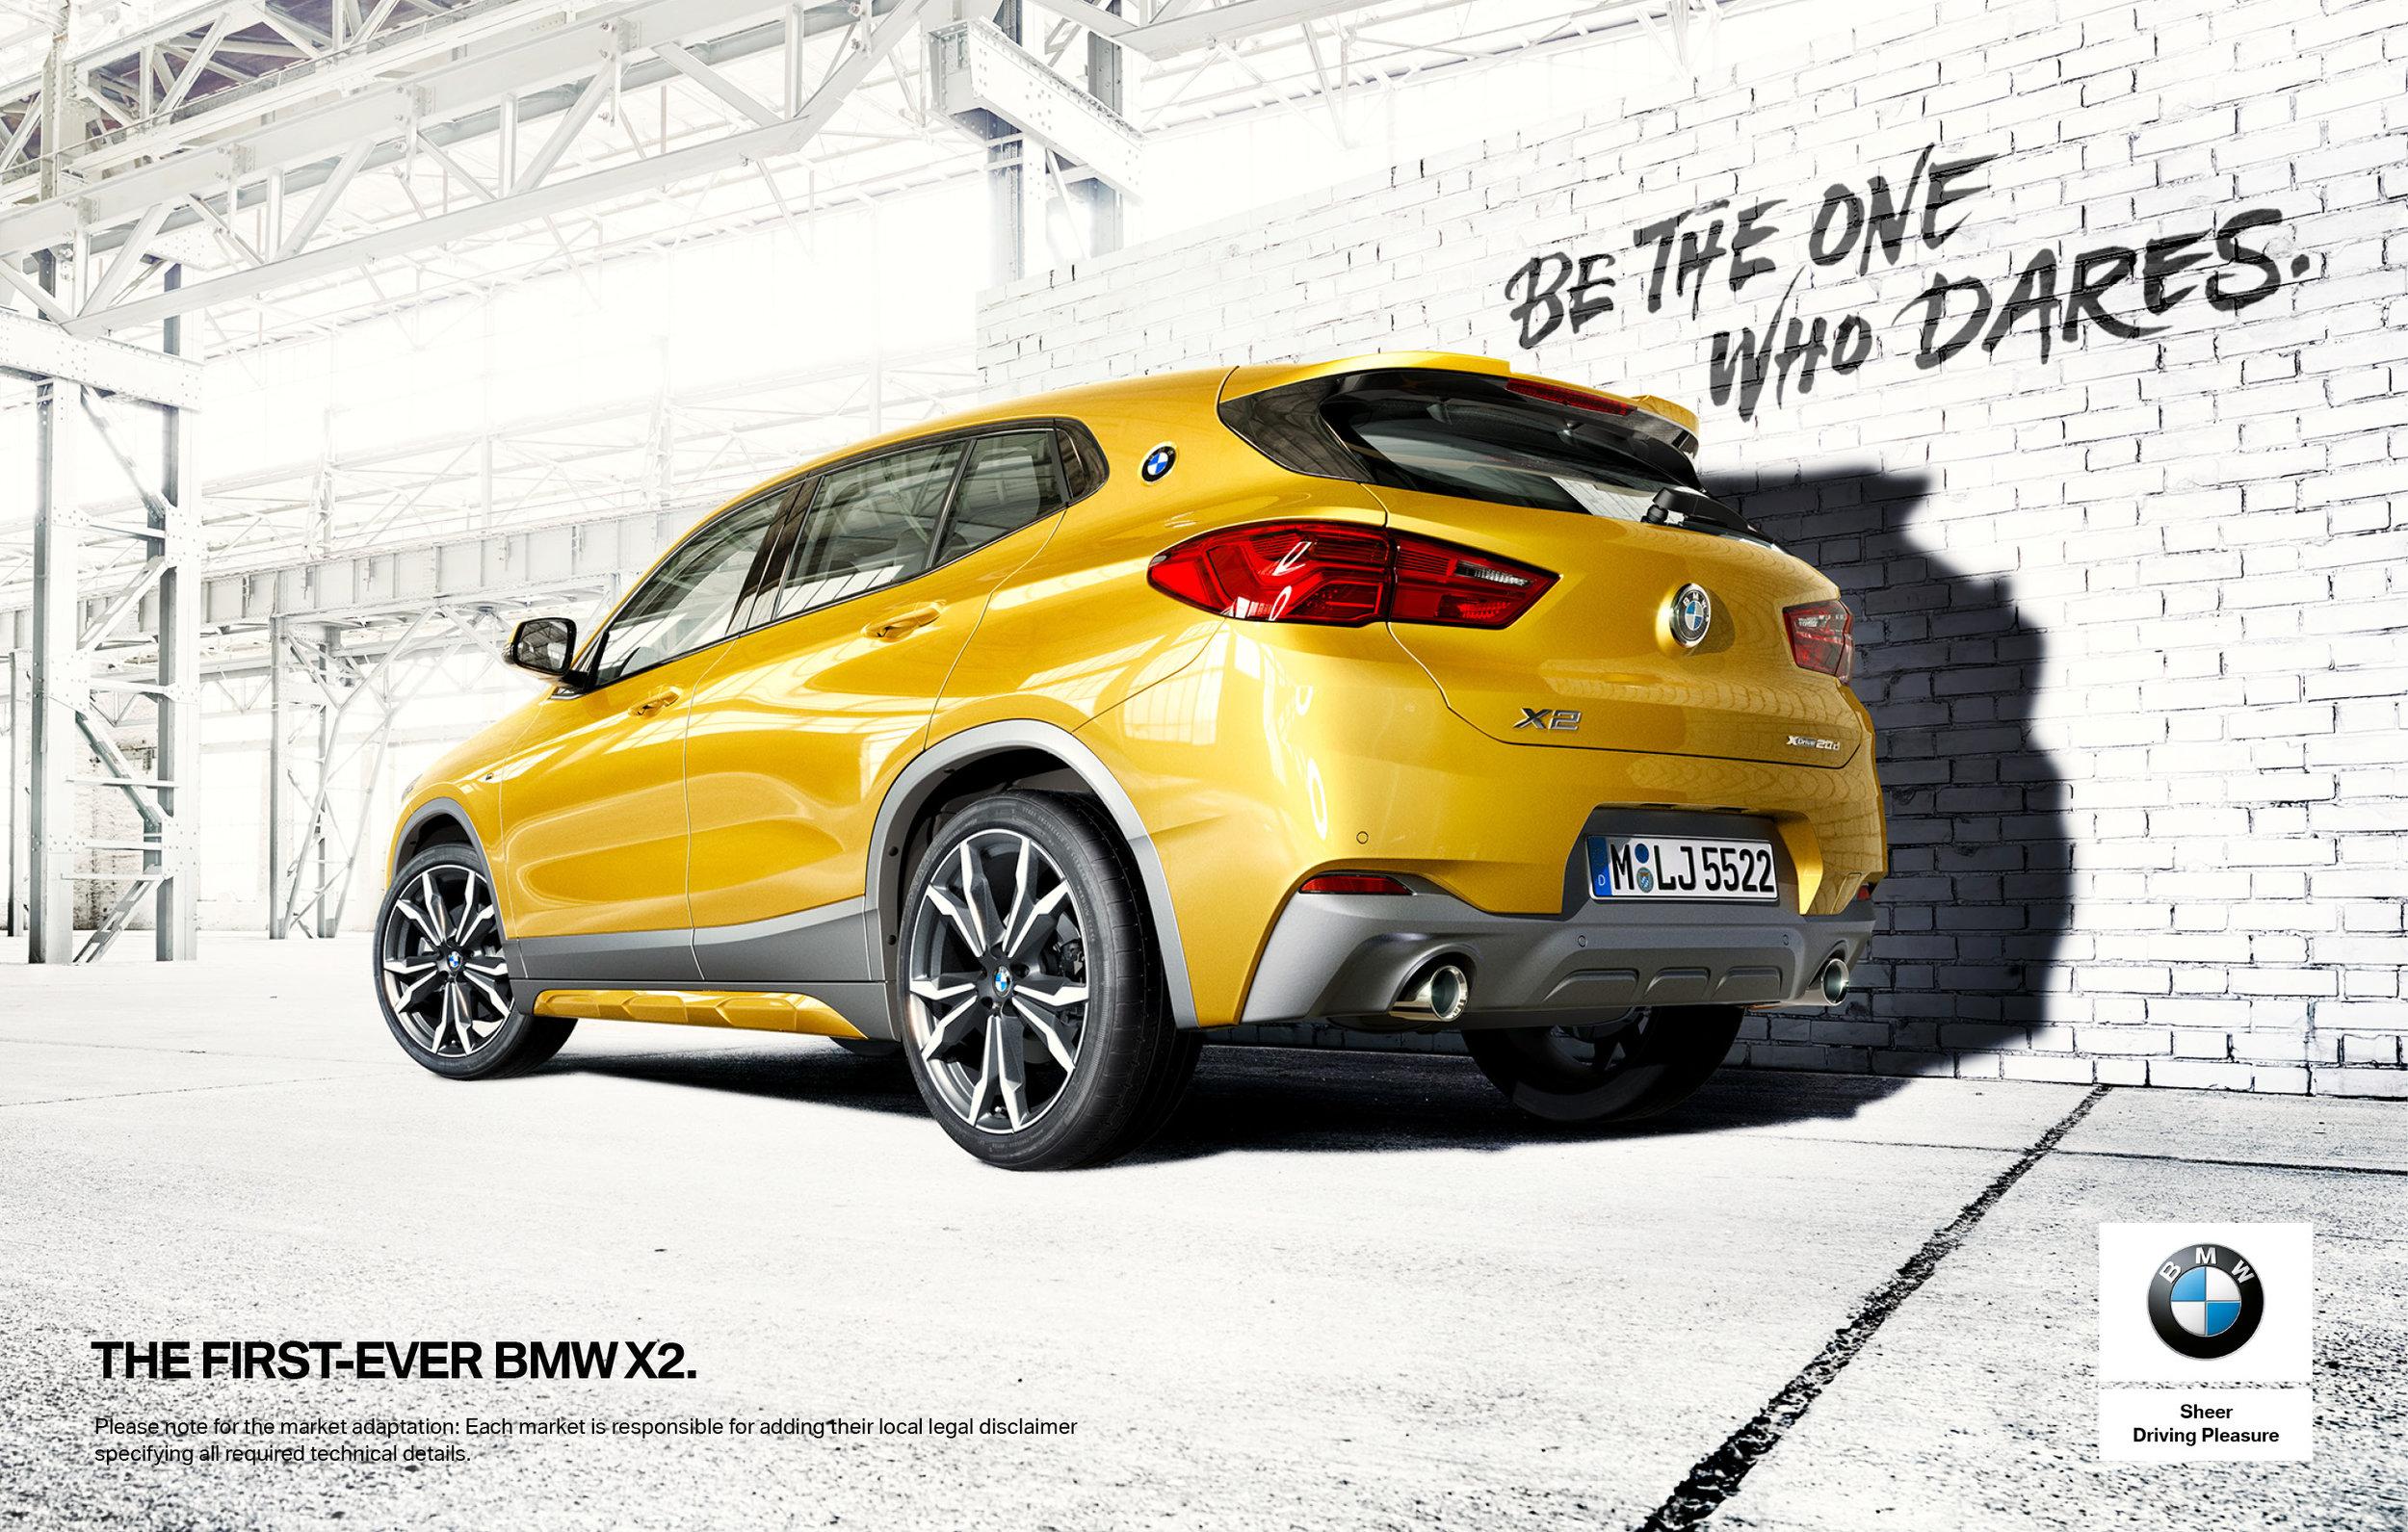 170713_BMW_x2_motive_ATL_heller2.jpg